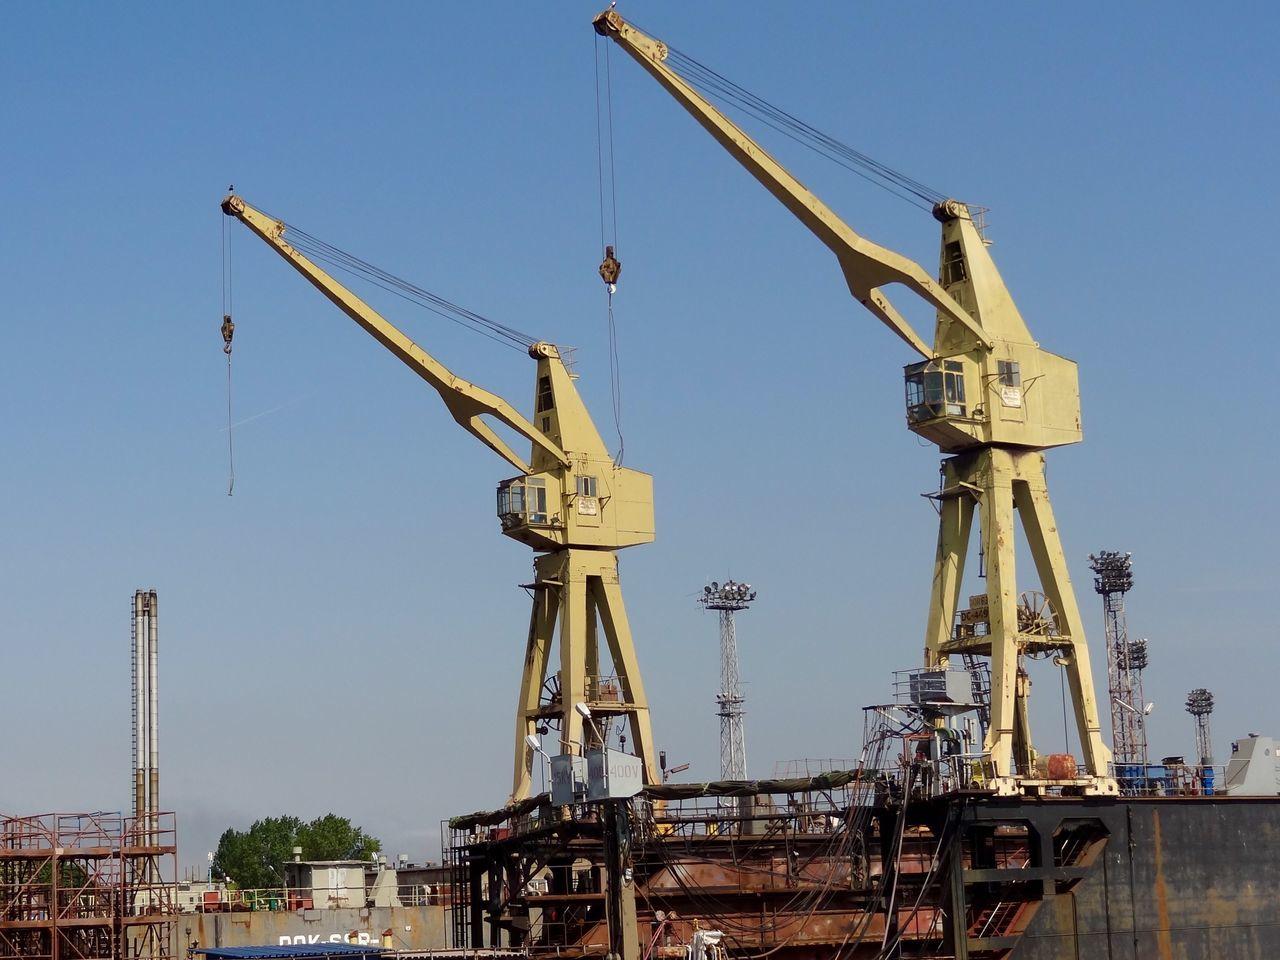 Aliens attack Crane - Construction Machinery Crane Cranes And Construction Cranes Harbour Cranes Mechanical Art Shipyard